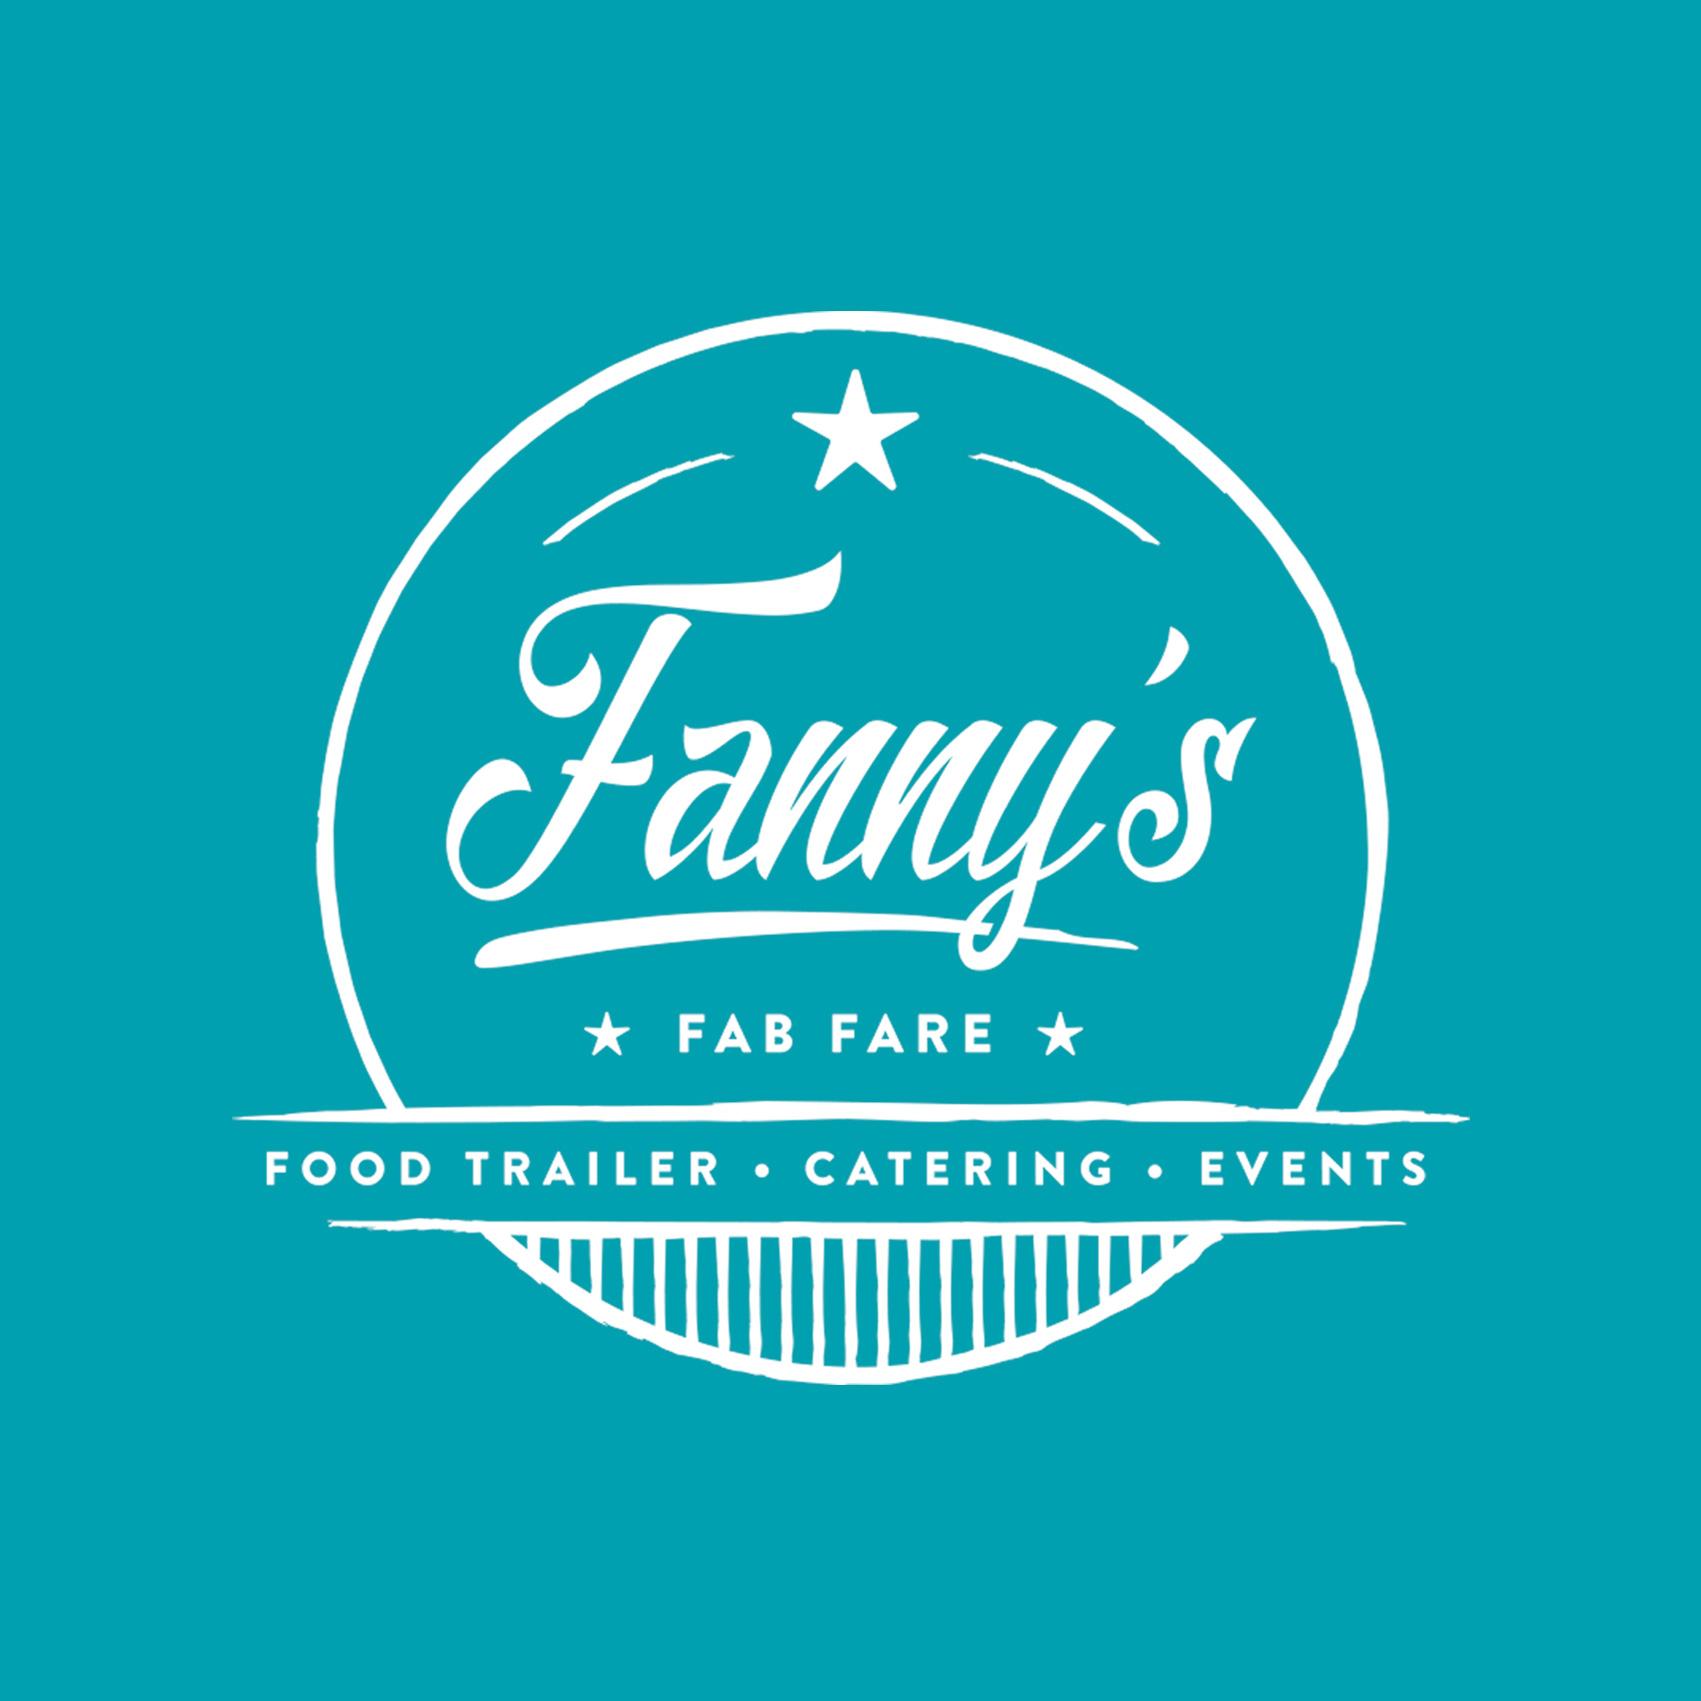 Fannys-Fab-Fare-Logo-visual-energy-wollongong-graphic-design-.jpg